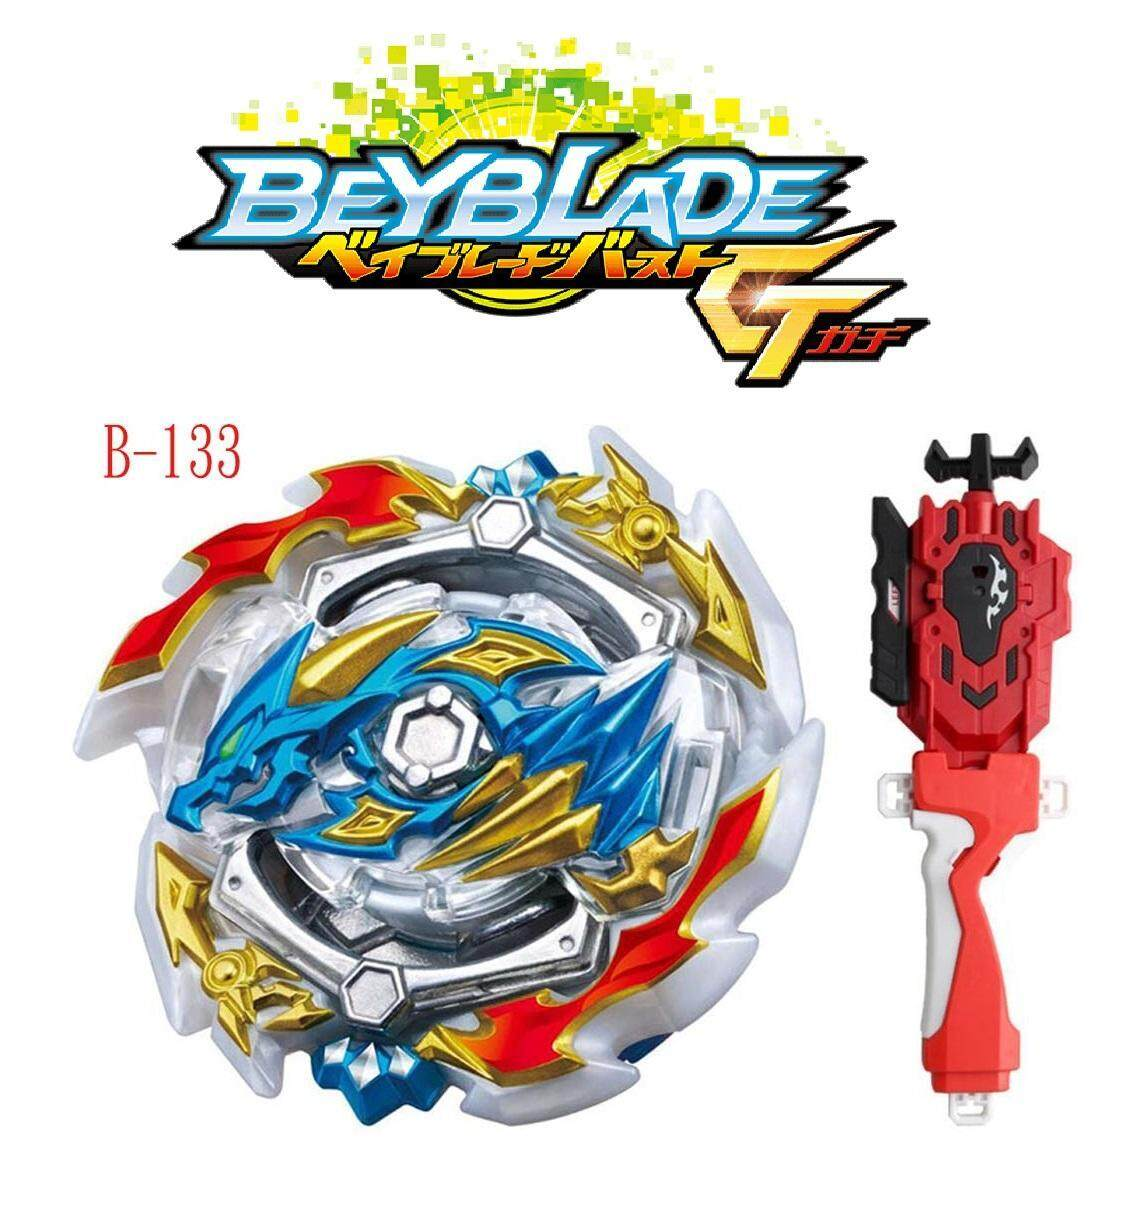 Beyblade Burst Set B-133 Ace Dragon.St.Ch DX Starter Launcher Beyblade Spinning Top Takara Tomy Toys for boys